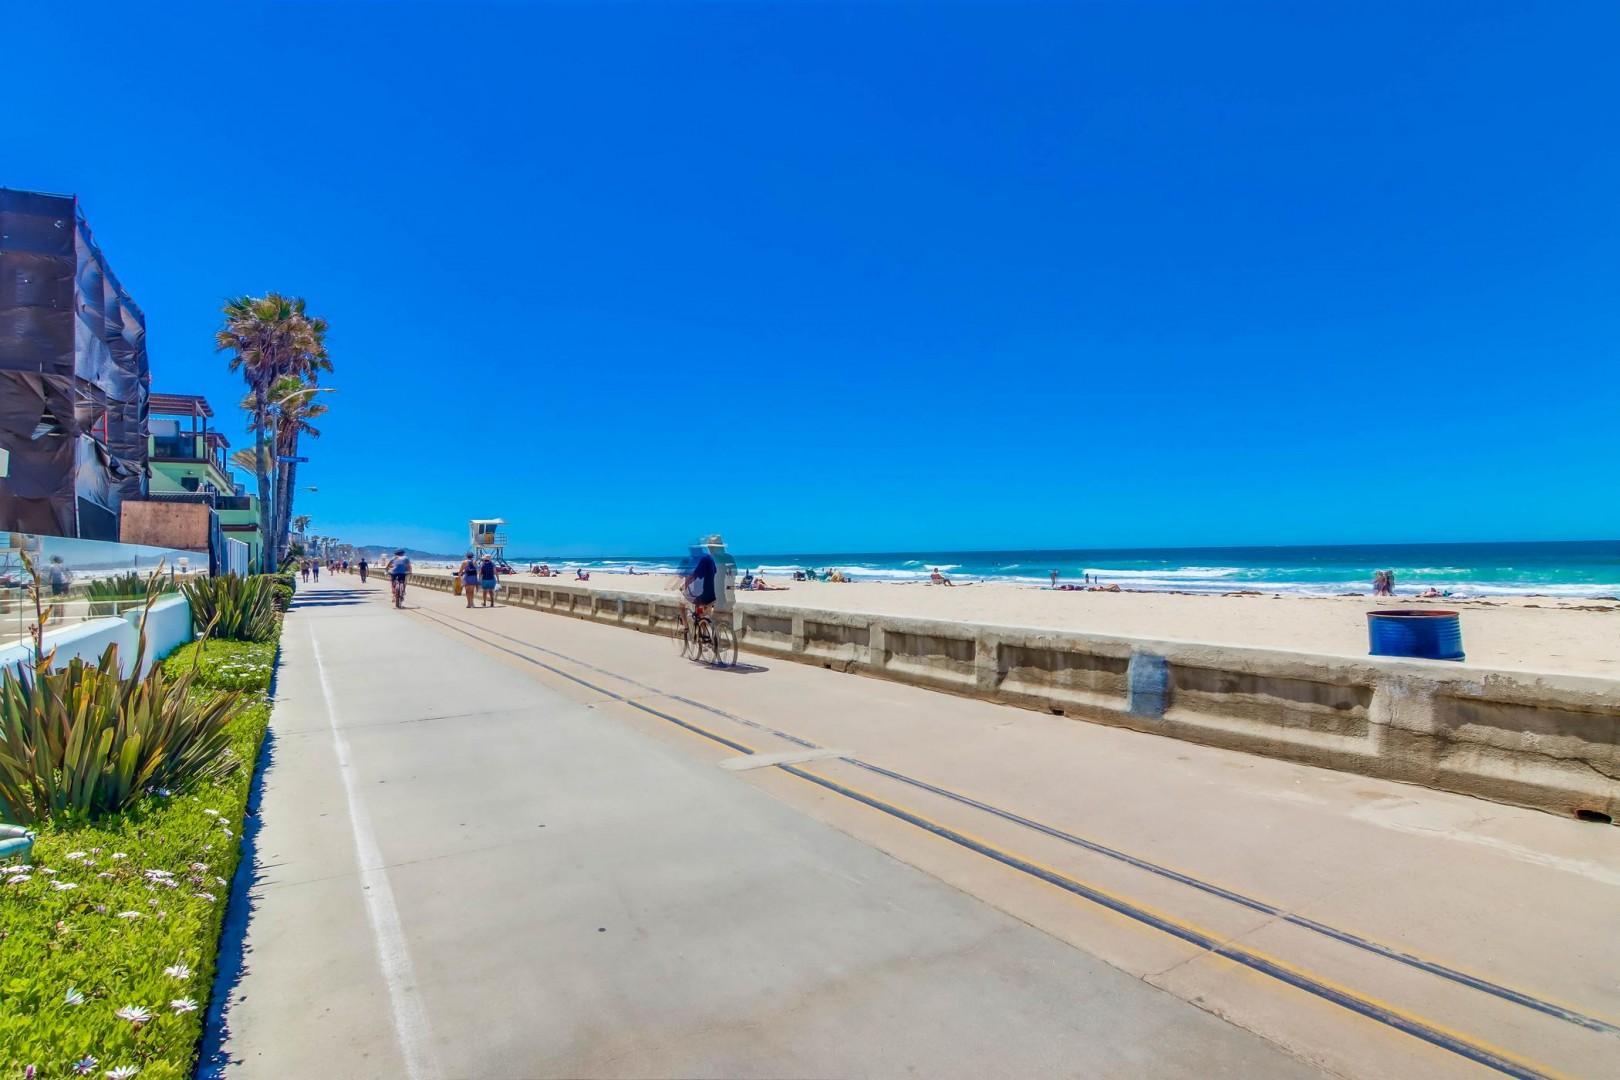 3721-strandway-2-061_2100x1400